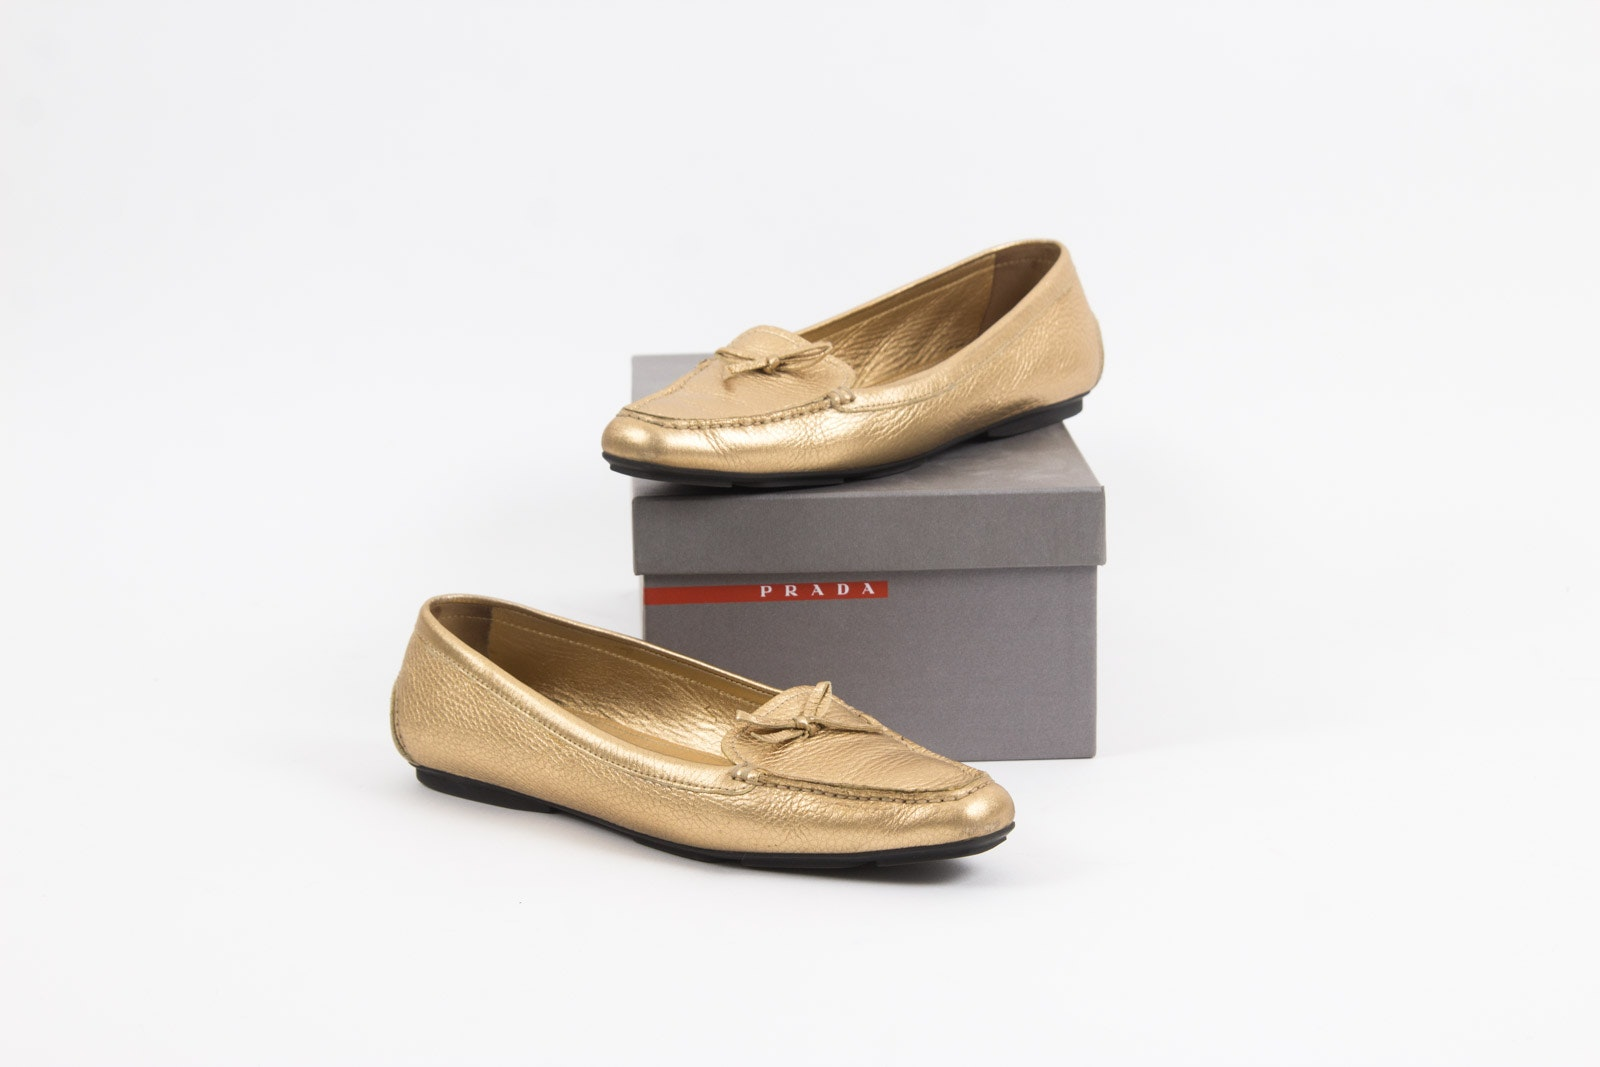 Prada Metallic Gold Tone Loafers